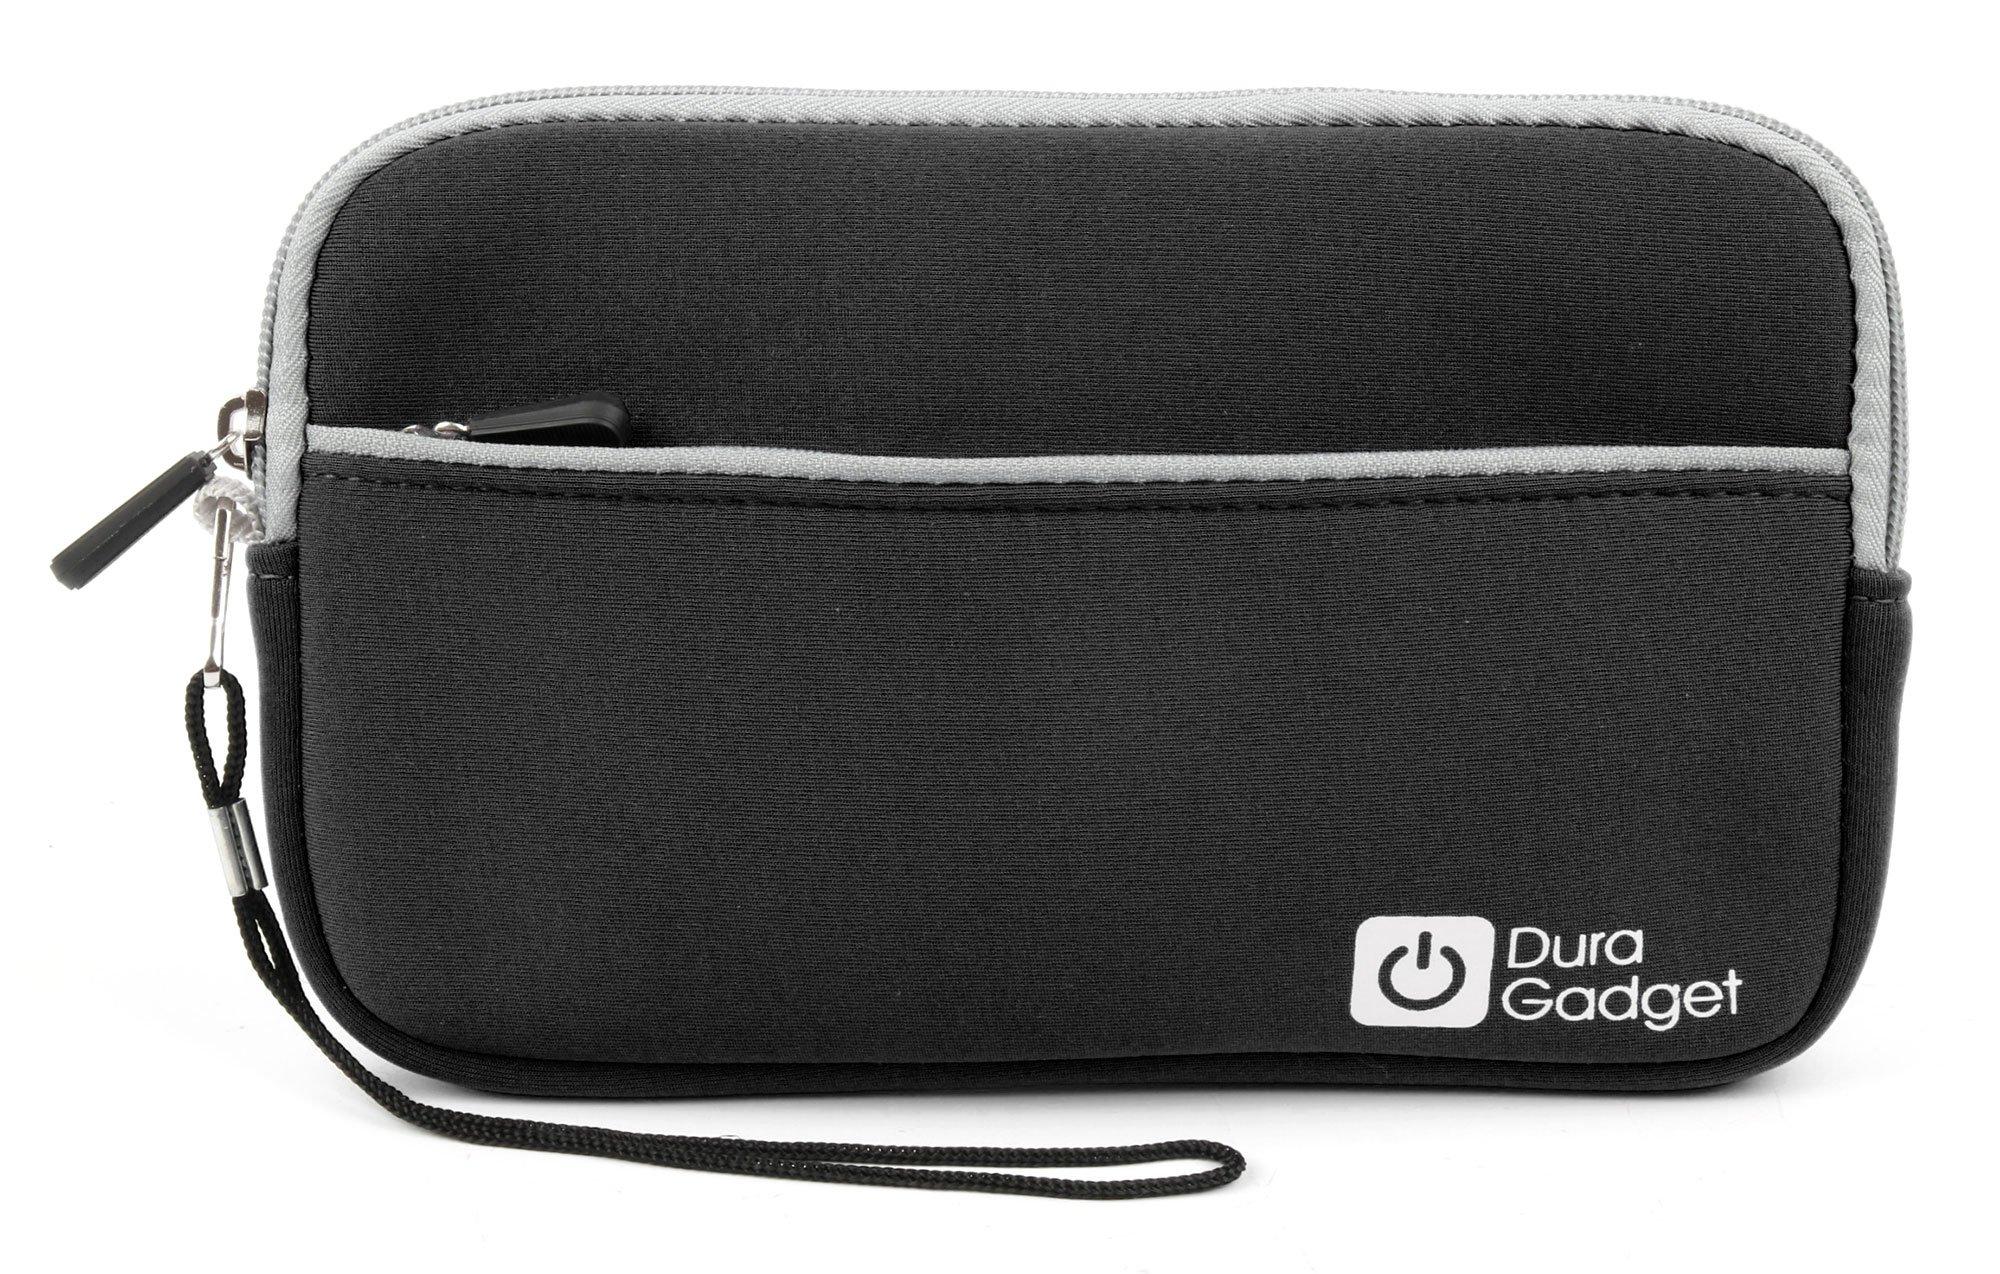 DURAGADGET Black 7'' Water & Scratch-Resistant Neoprene Case - Compatible with Navpal 7''